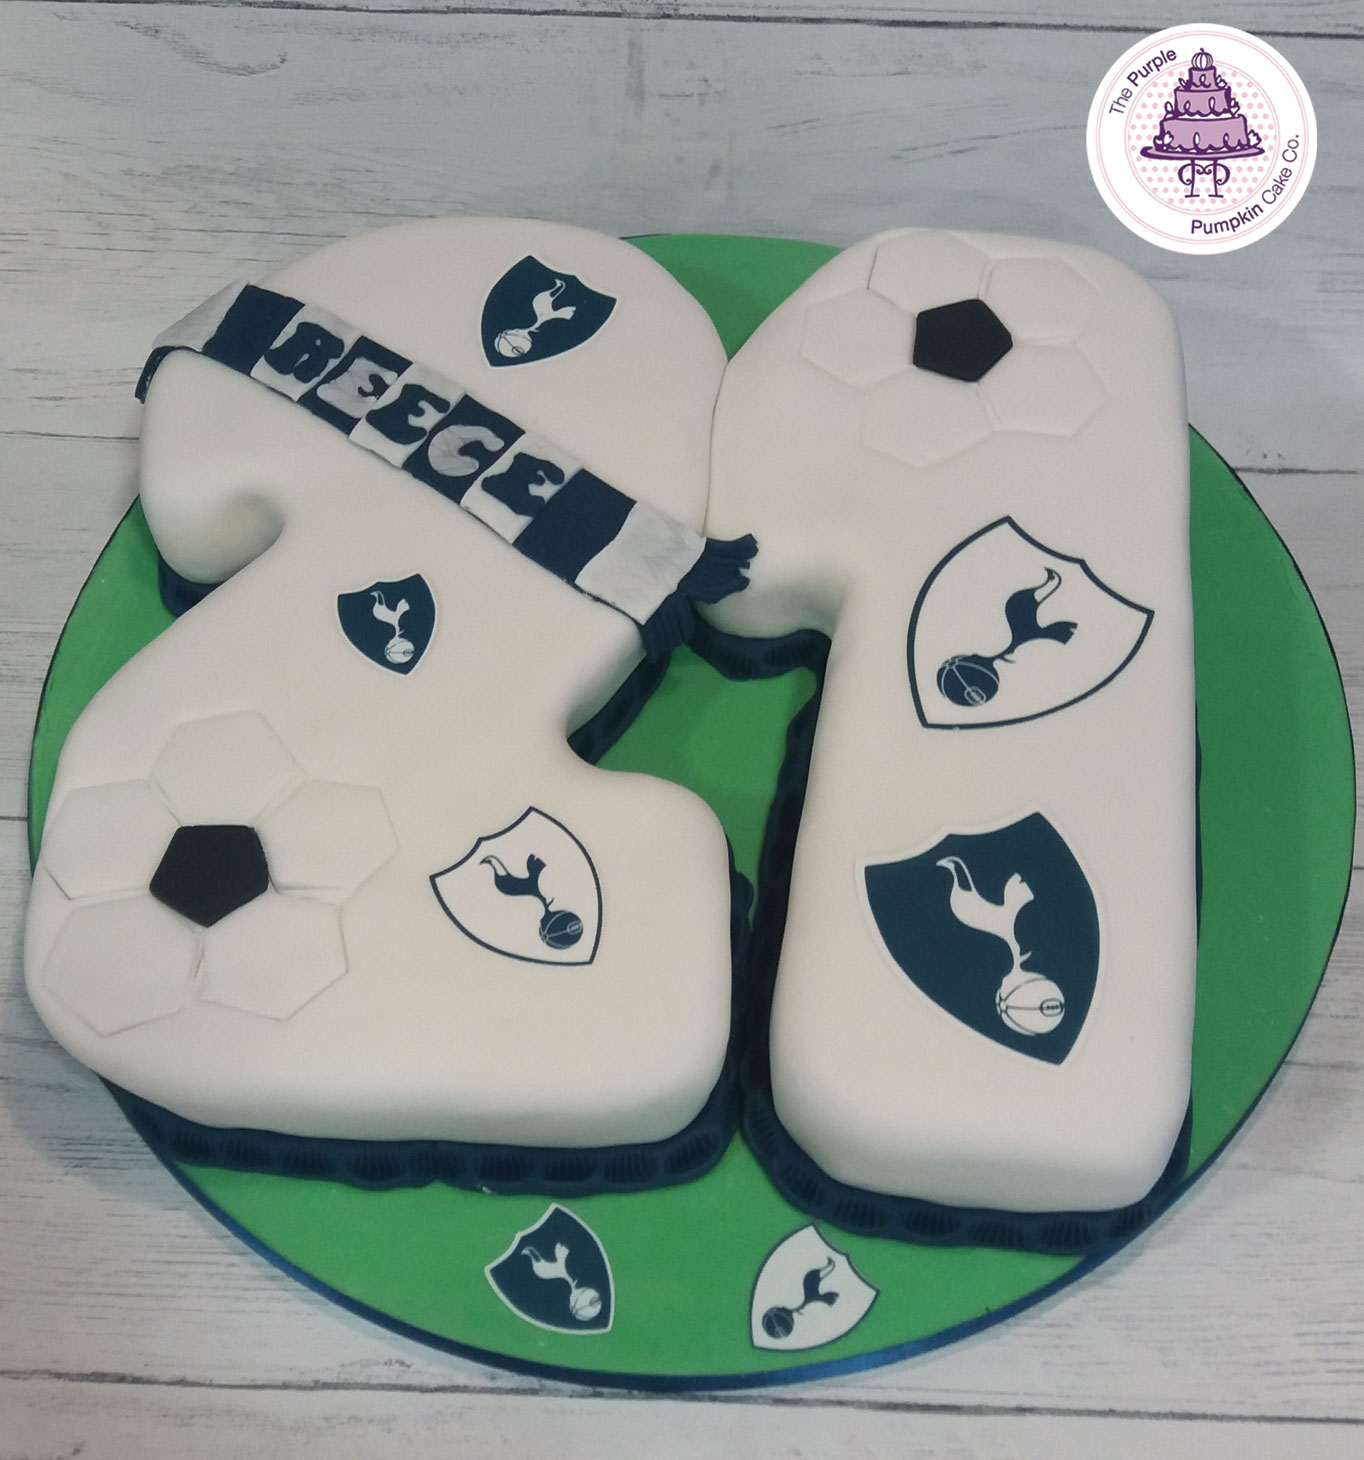 spurs 21 cake